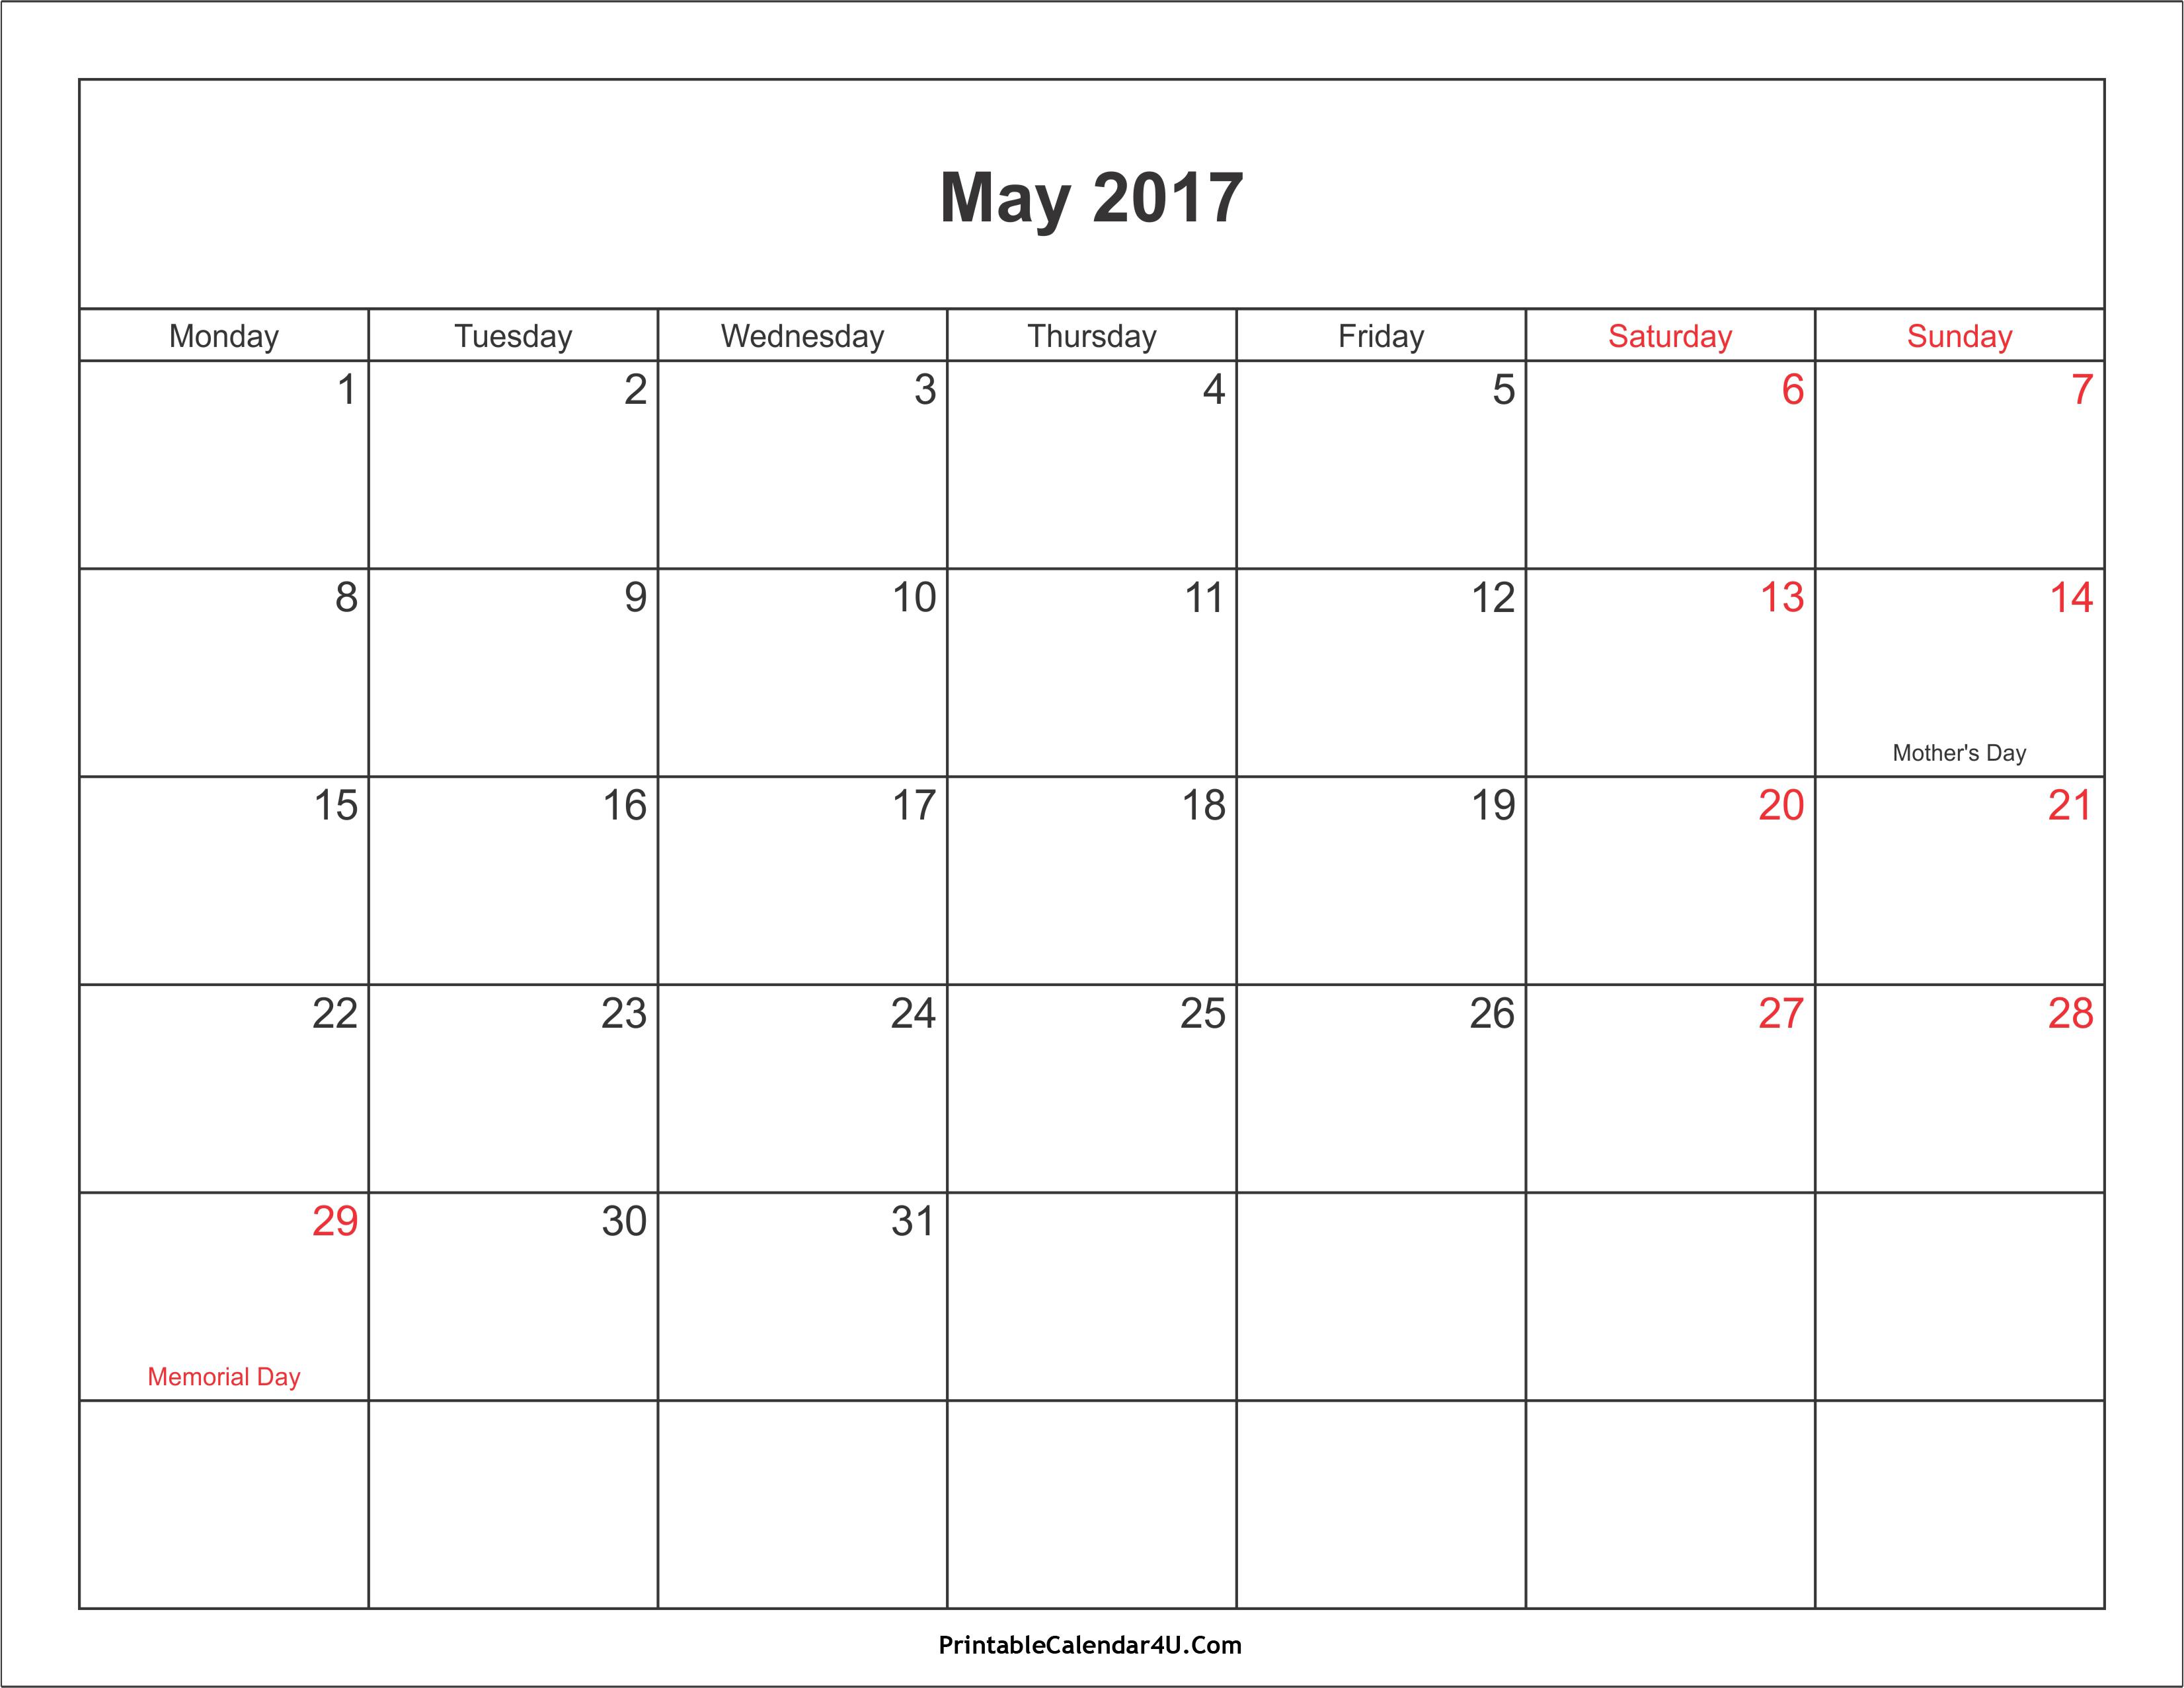 May 2017 Calendar Printable with Holidays PDF and